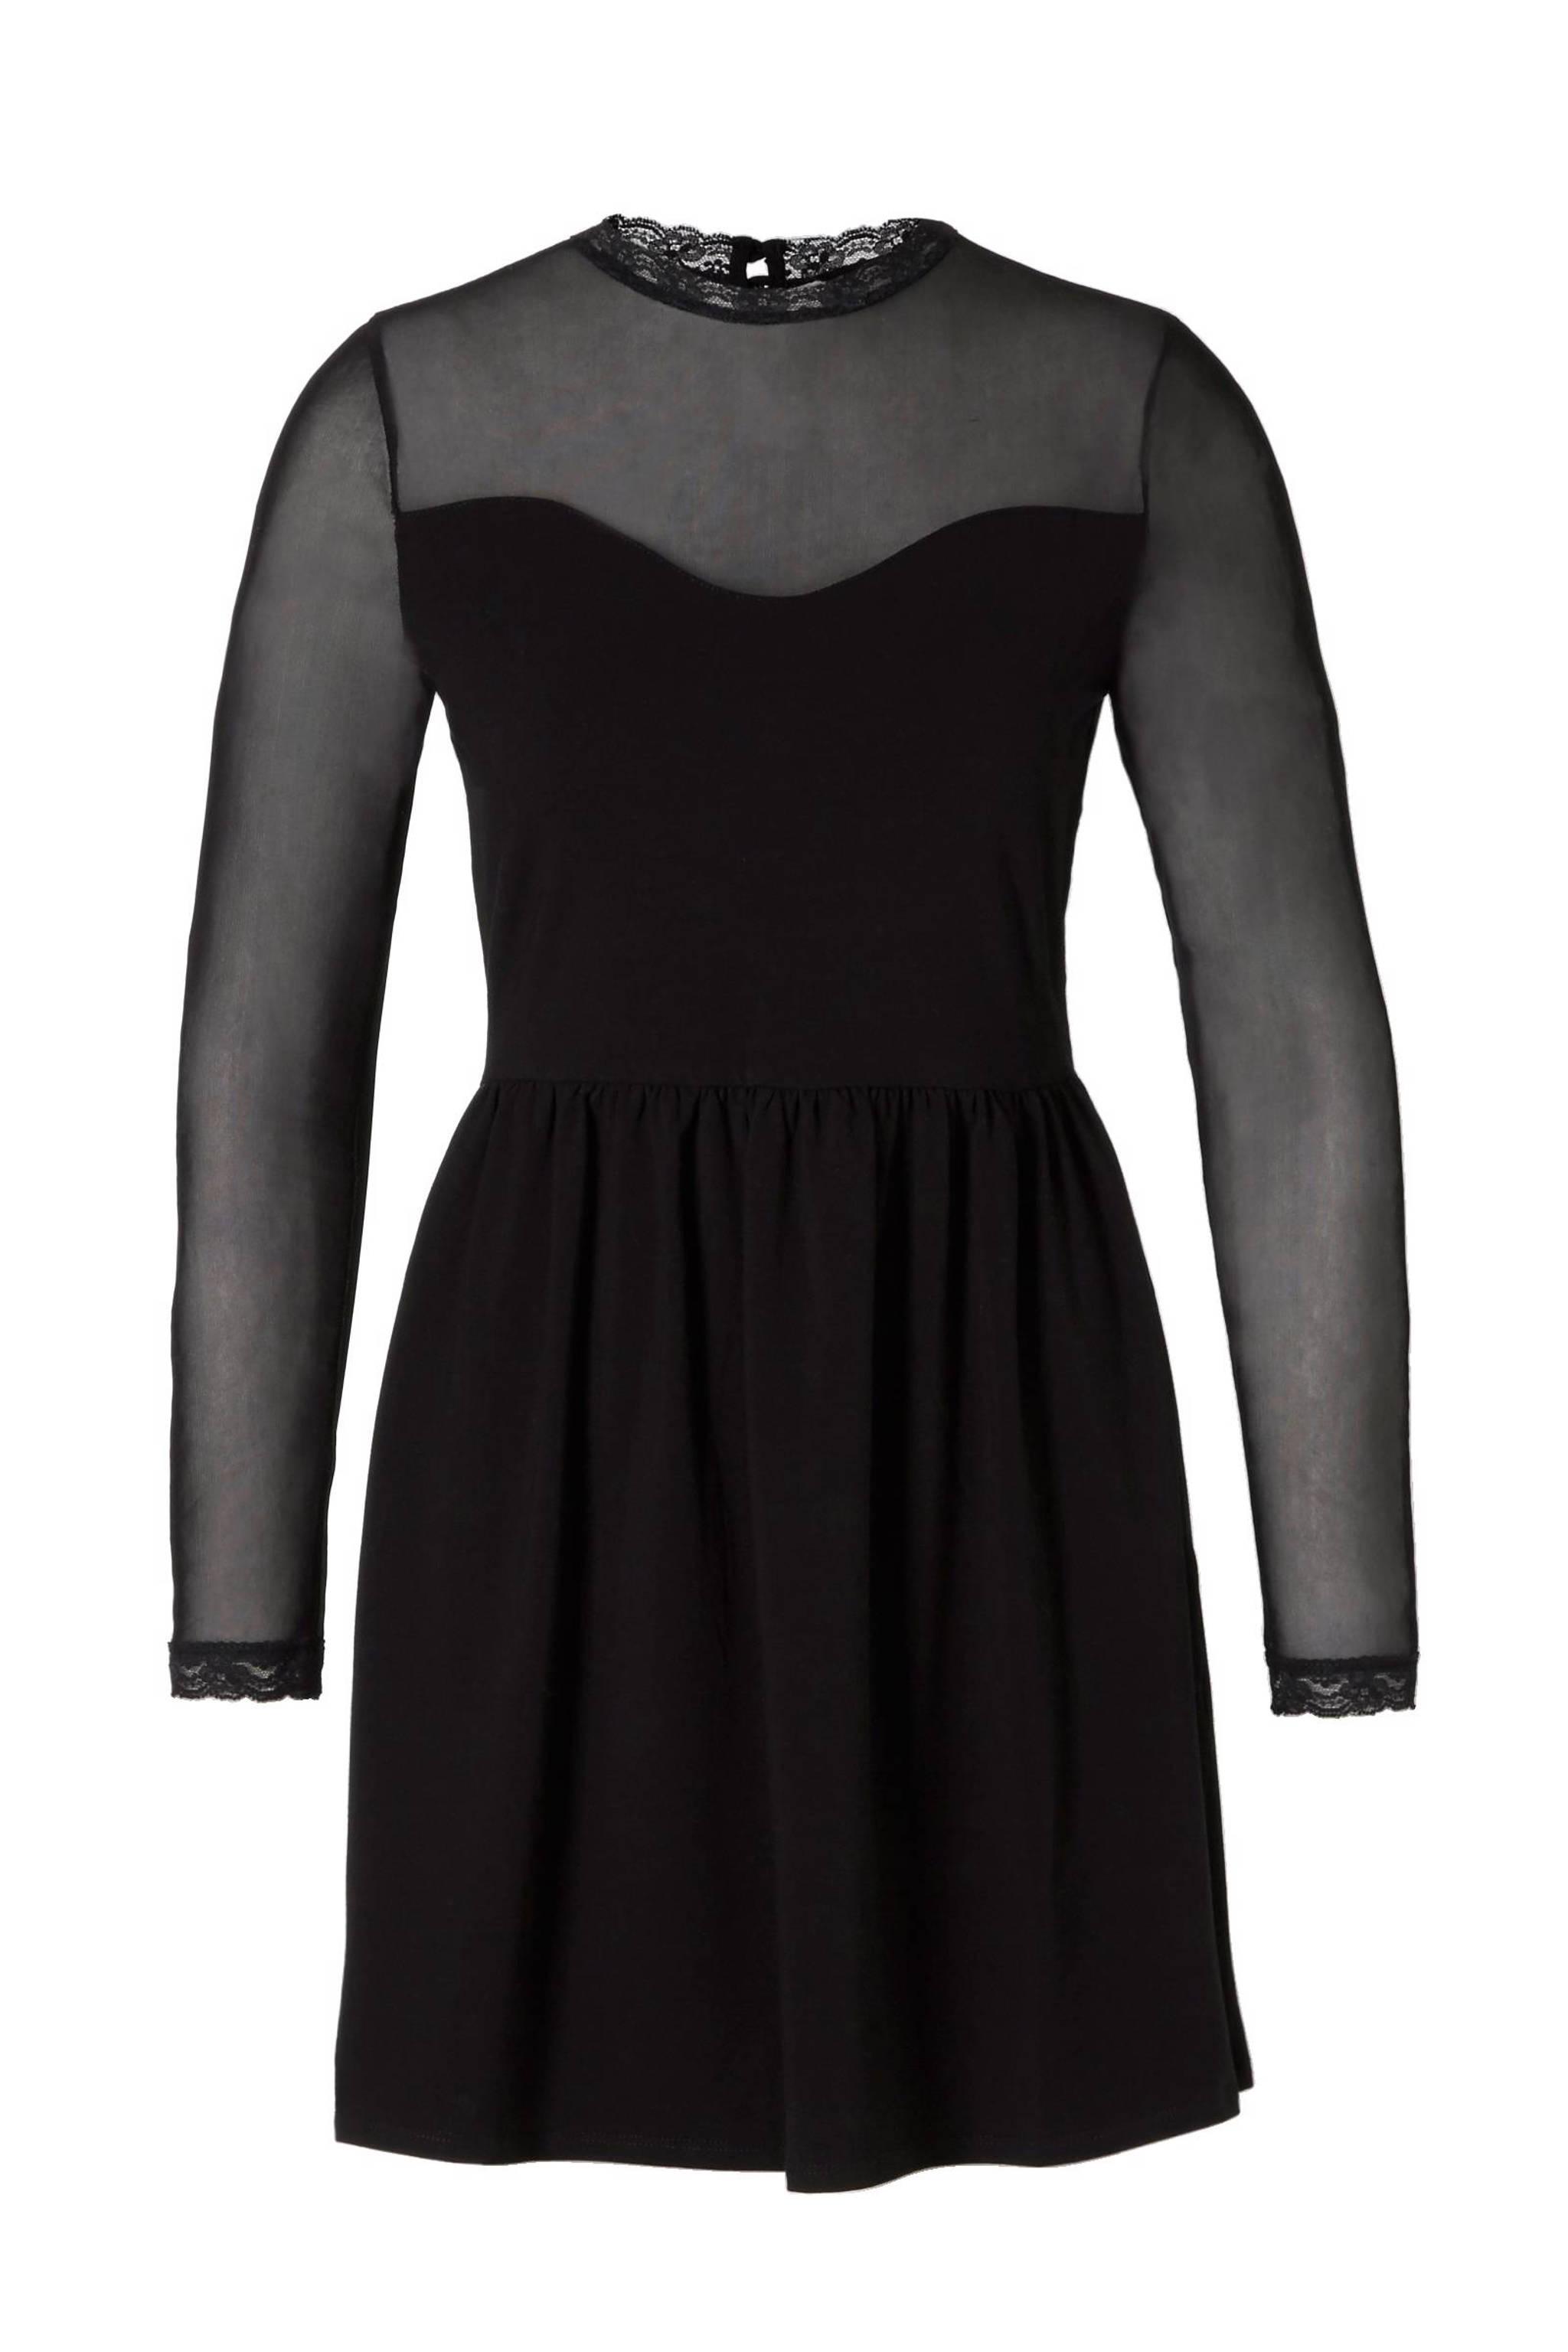 f3691df2c74e7d ONLY jurk met mesh